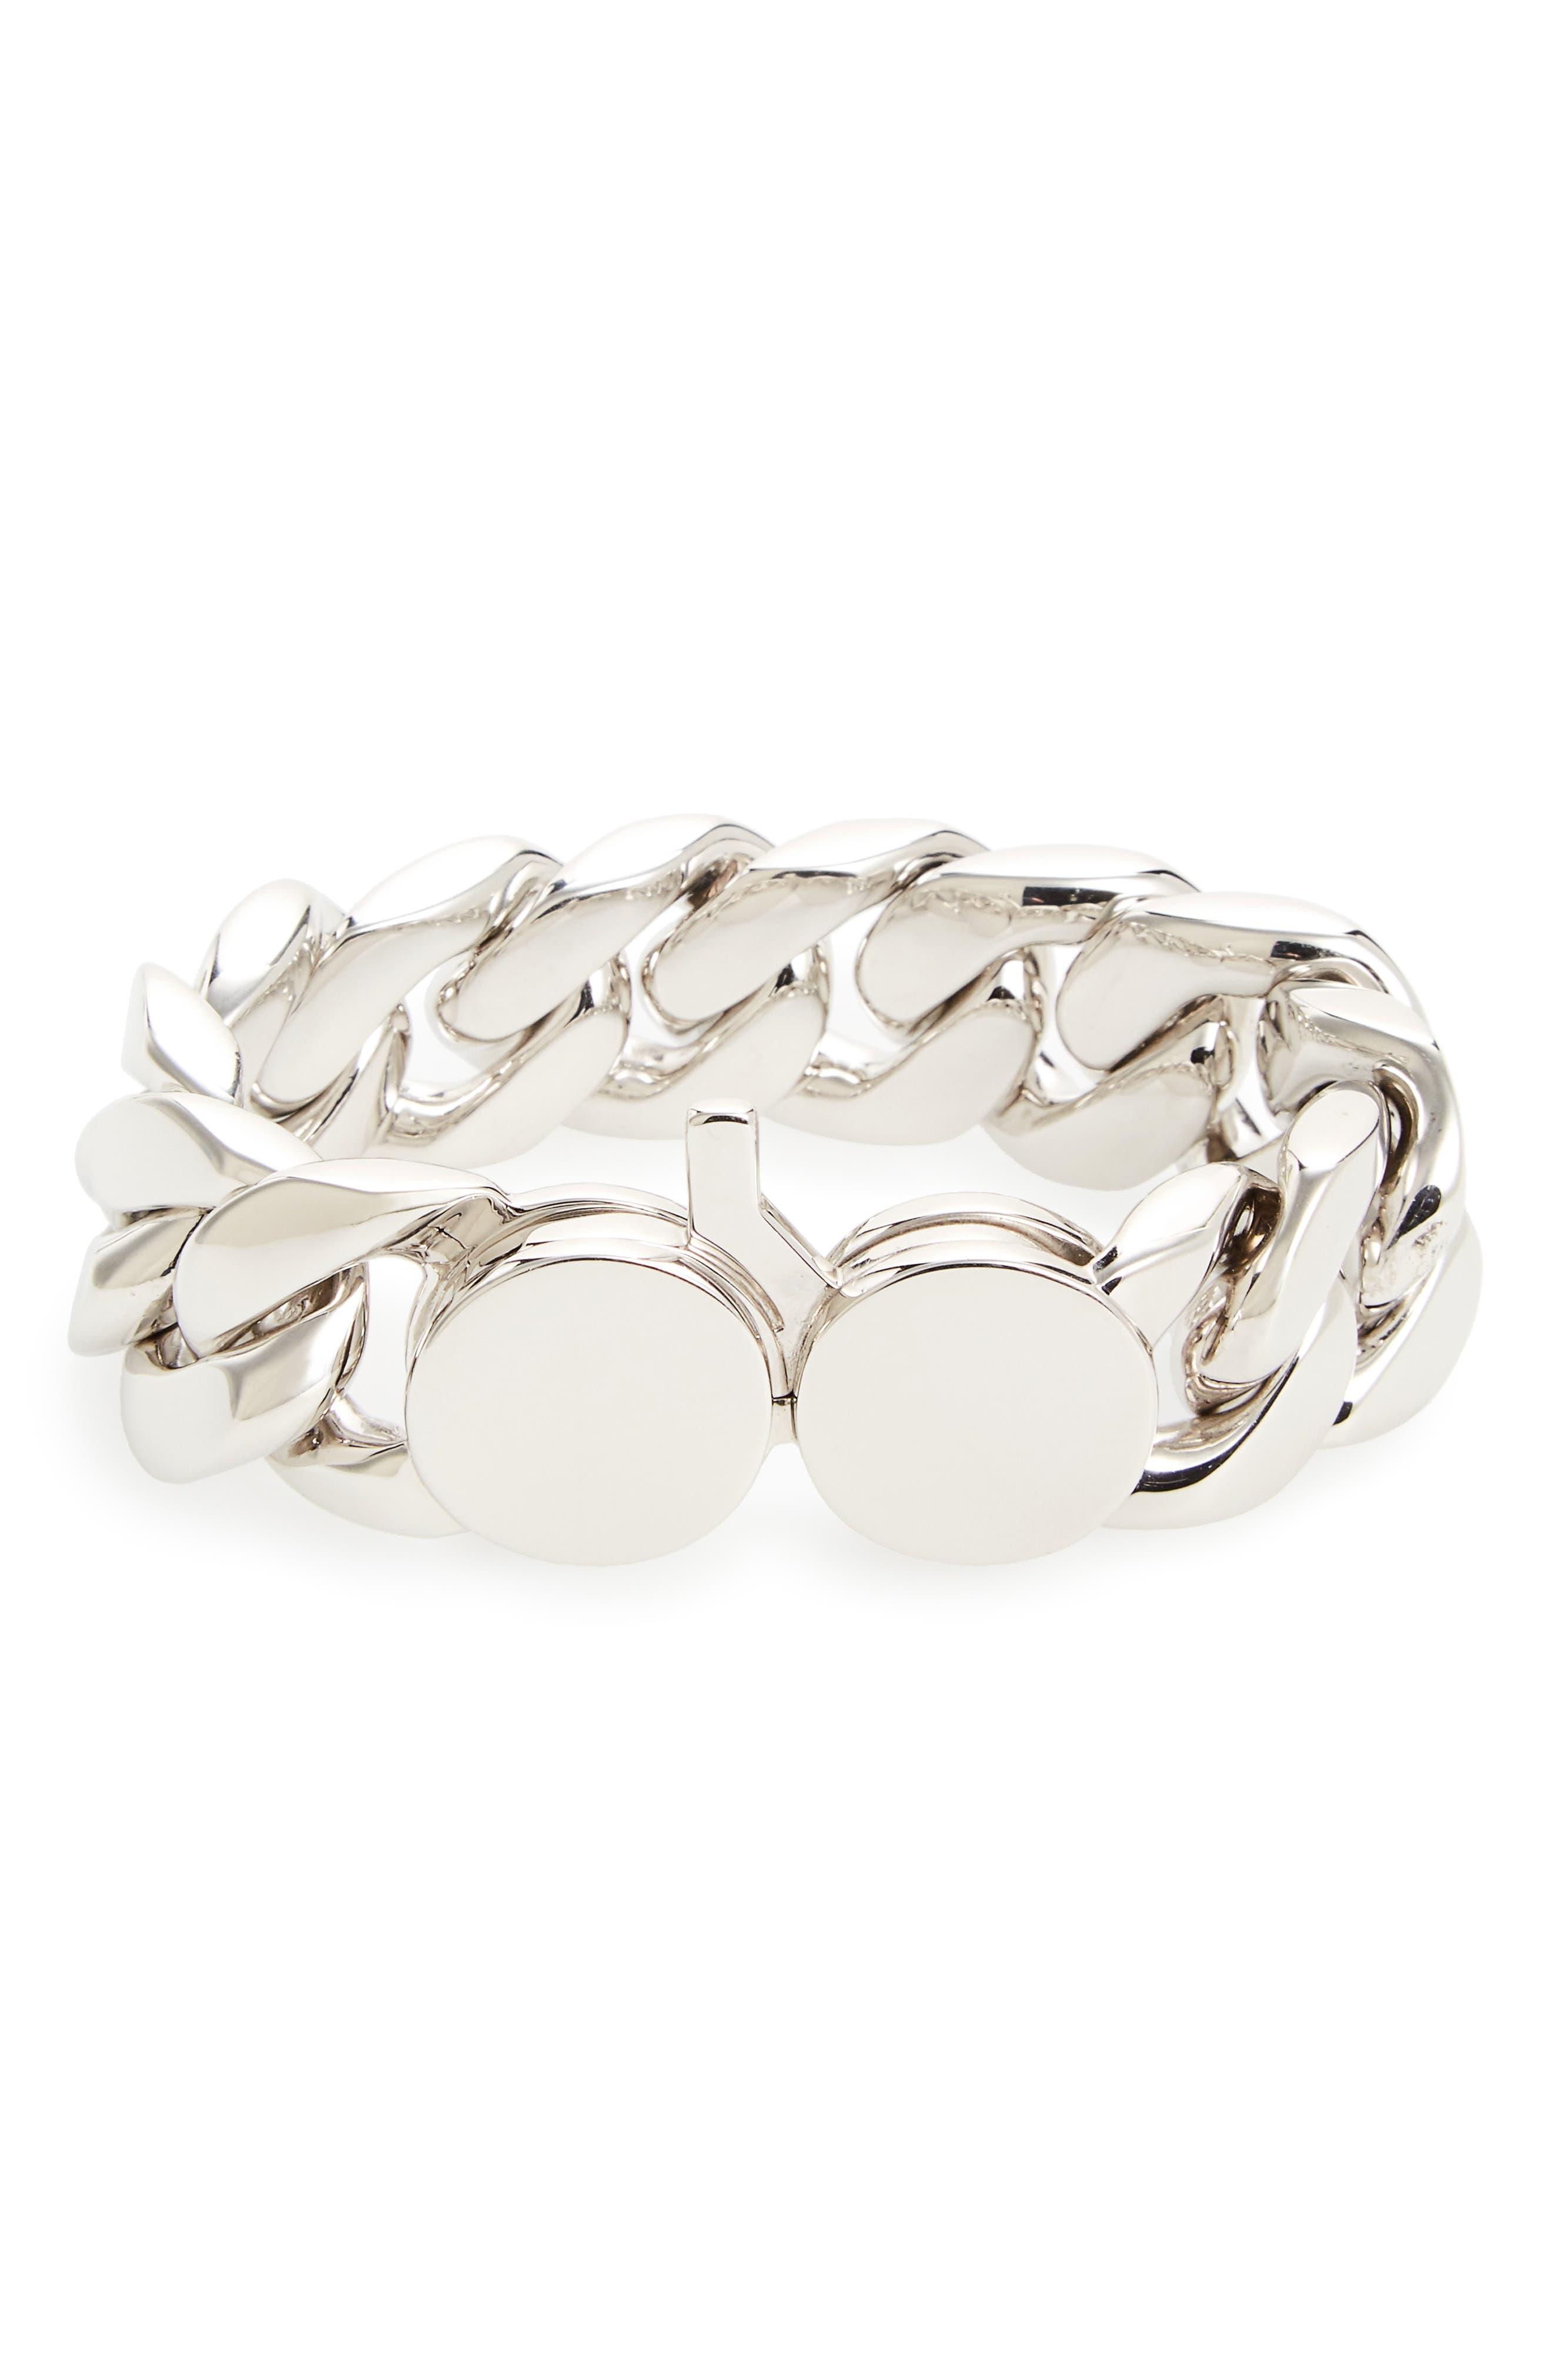 Main Image - Tom Wood Medium Chunky Silver Chain Link Bracelet